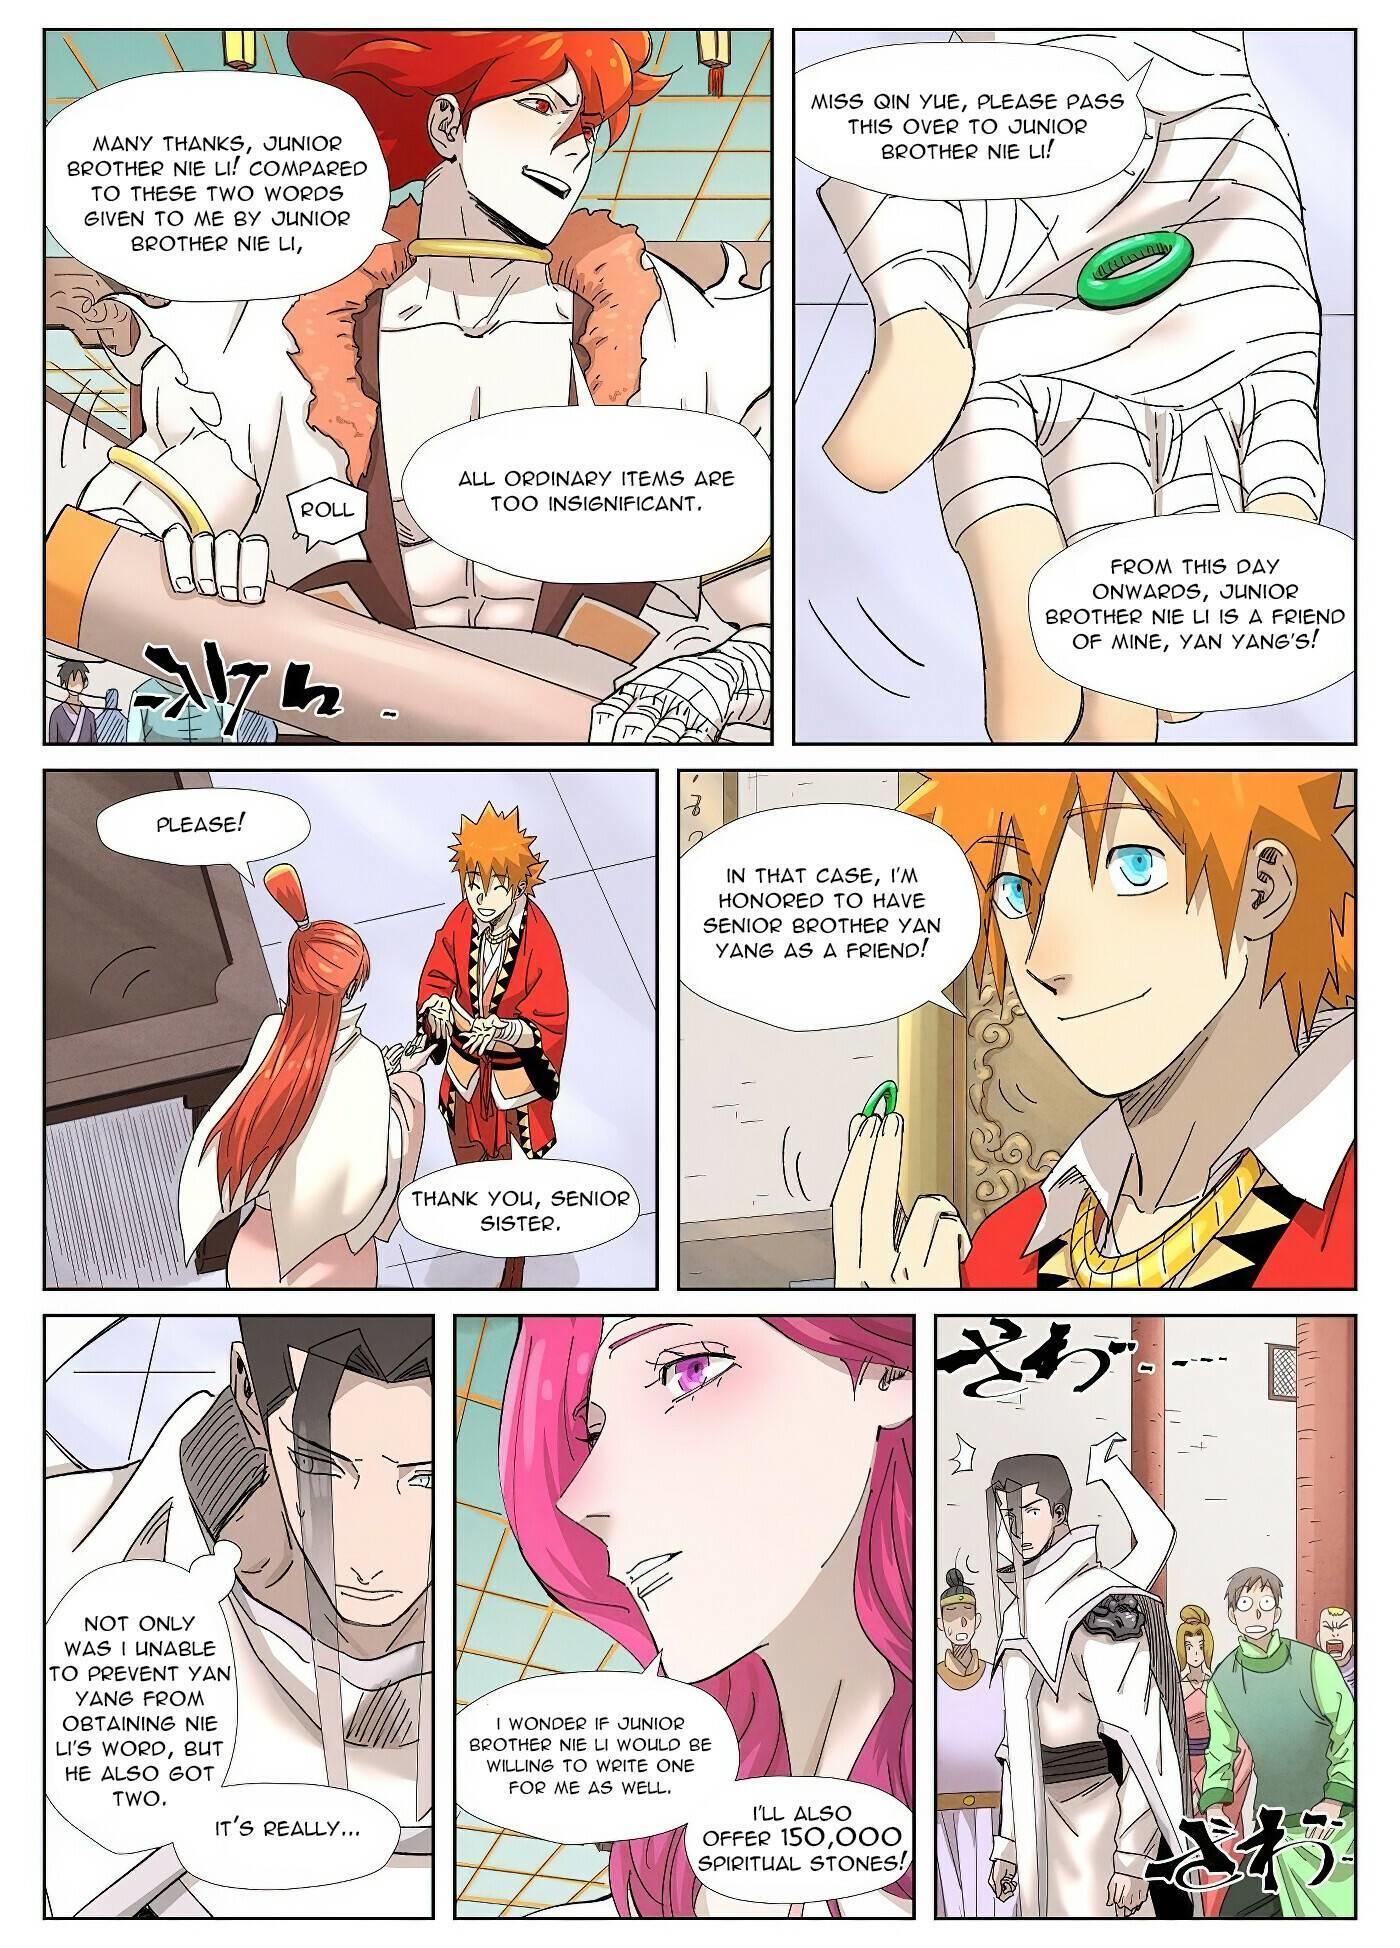 Tales Of Demons And Gods Chapter 342 page 8 - Mangakakalot